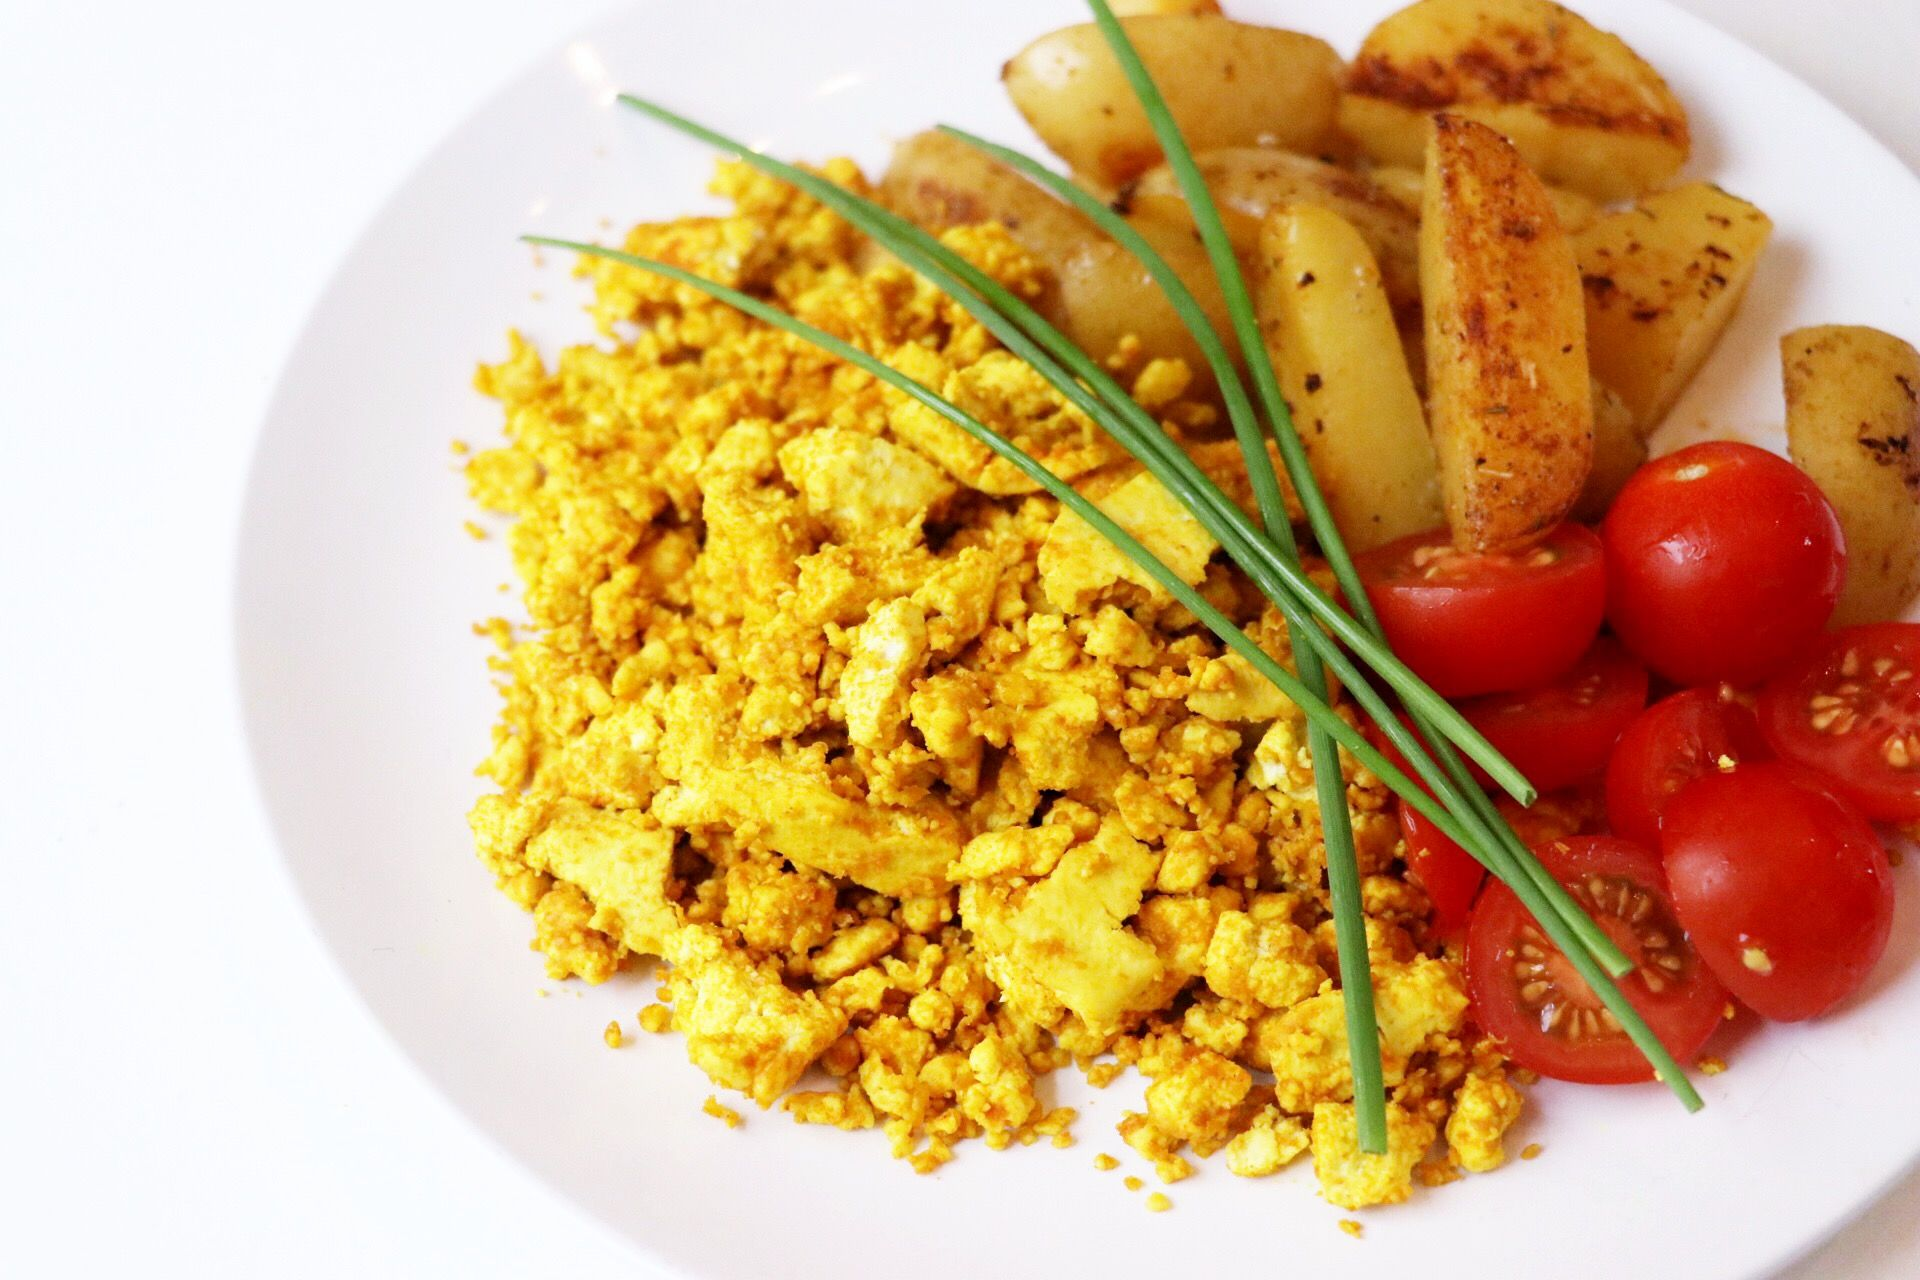 Vegan Egg-free Breakfast Scramble - Forkly